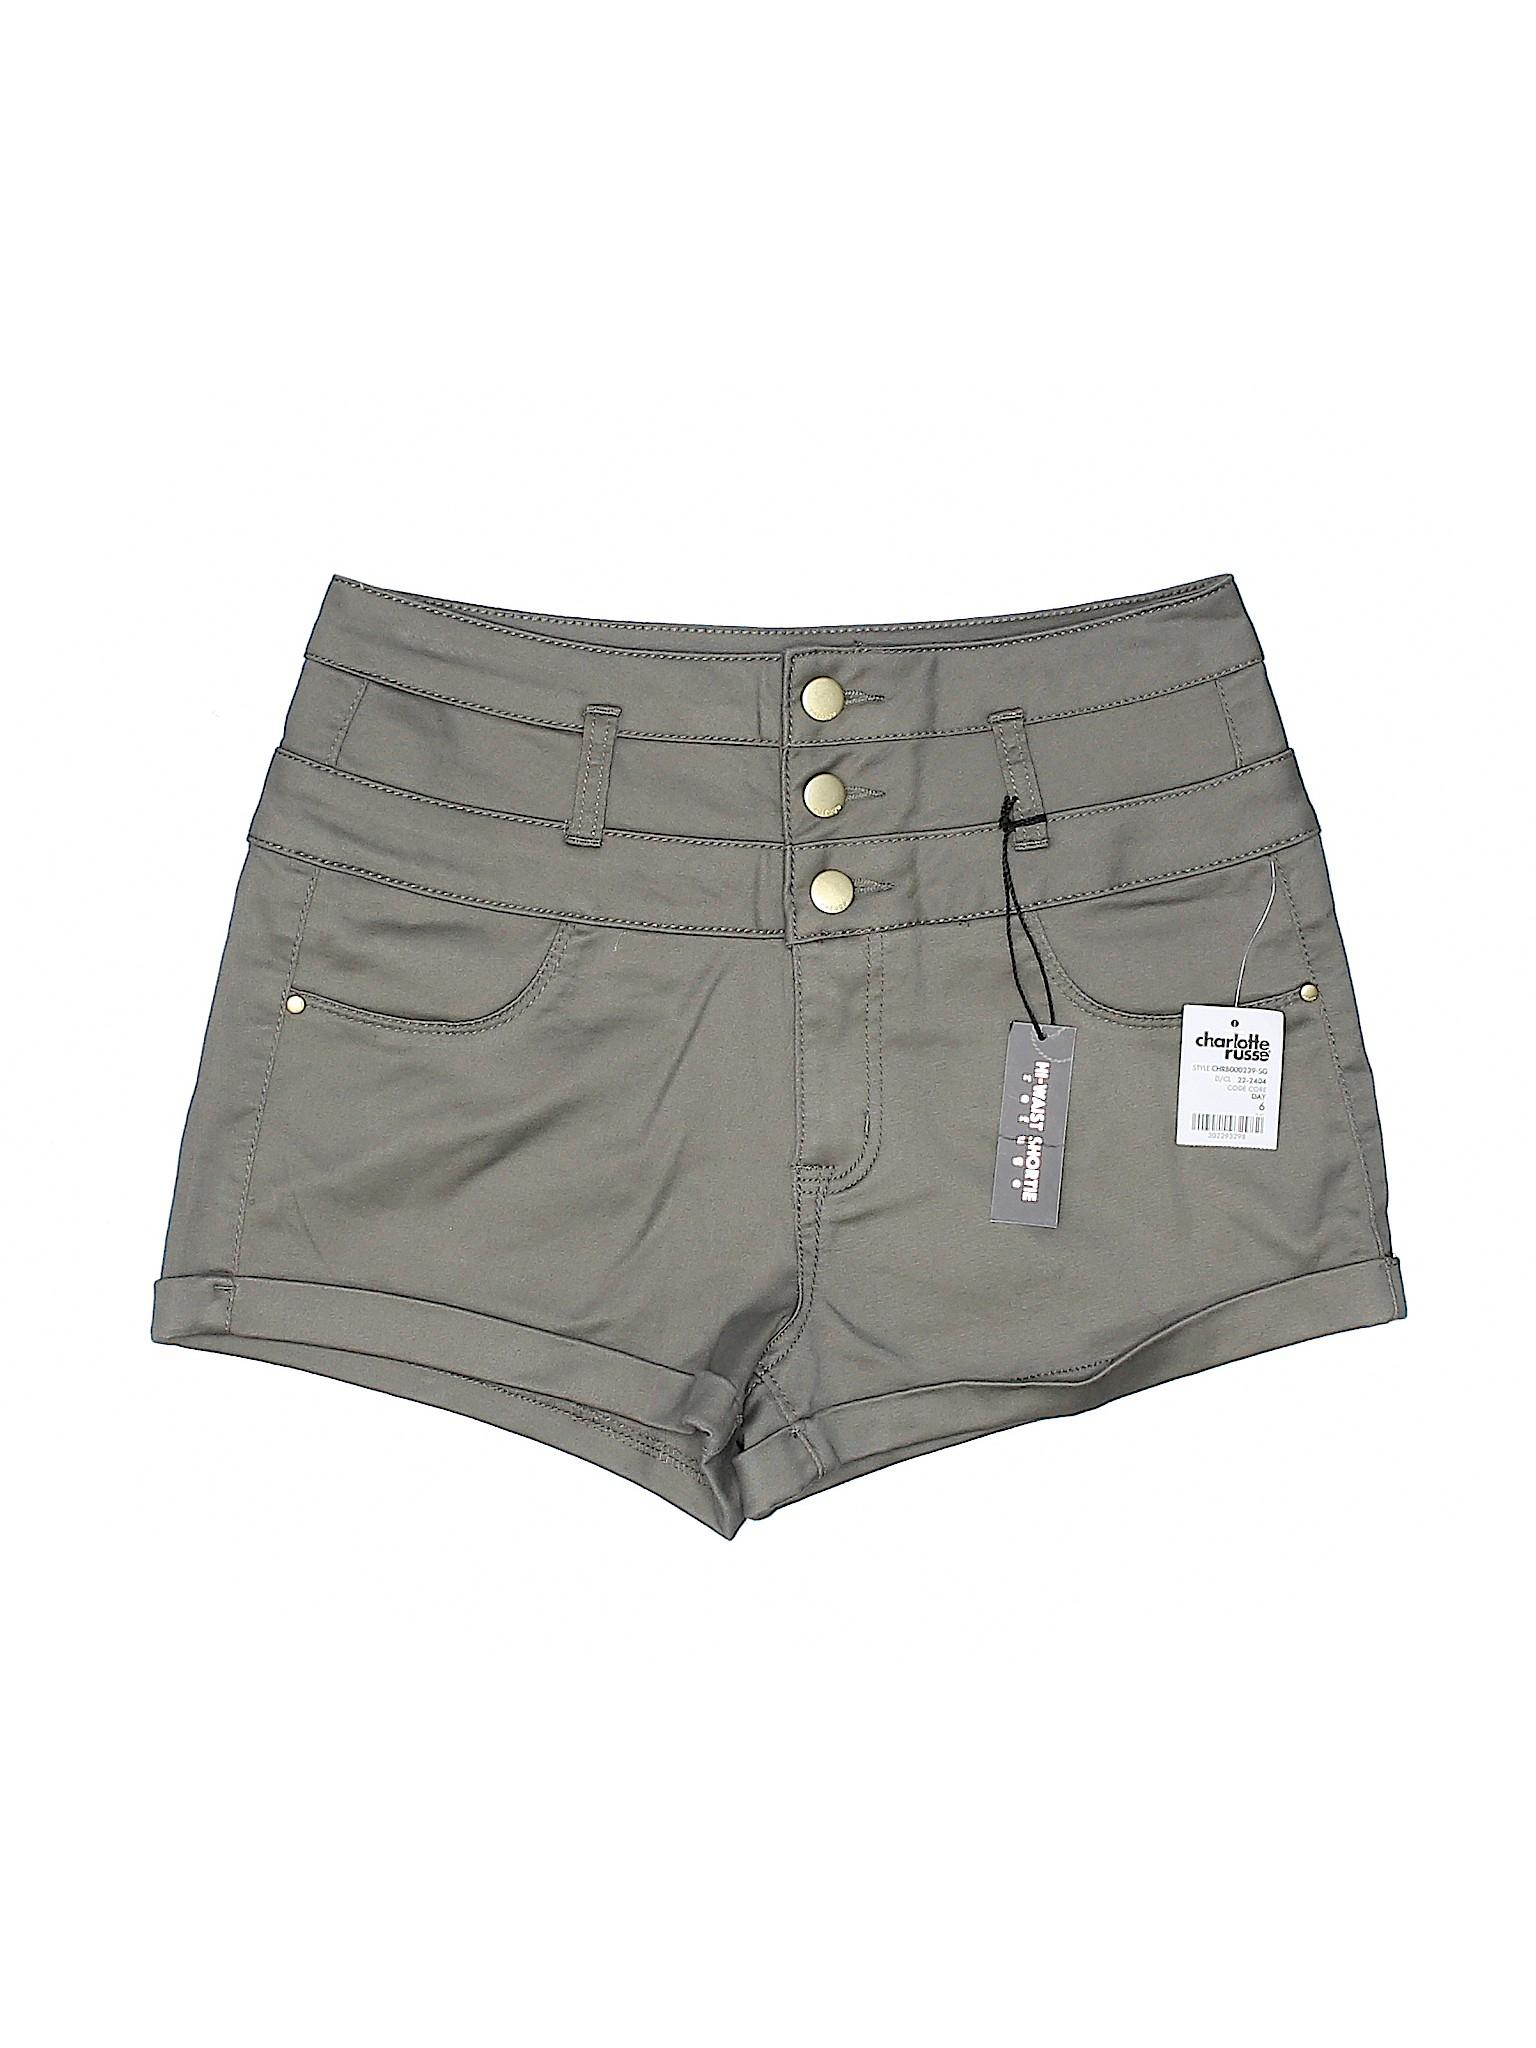 Boutique Boutique Refuge Refuge Shorts Khaki Khaki qvawq4xZ